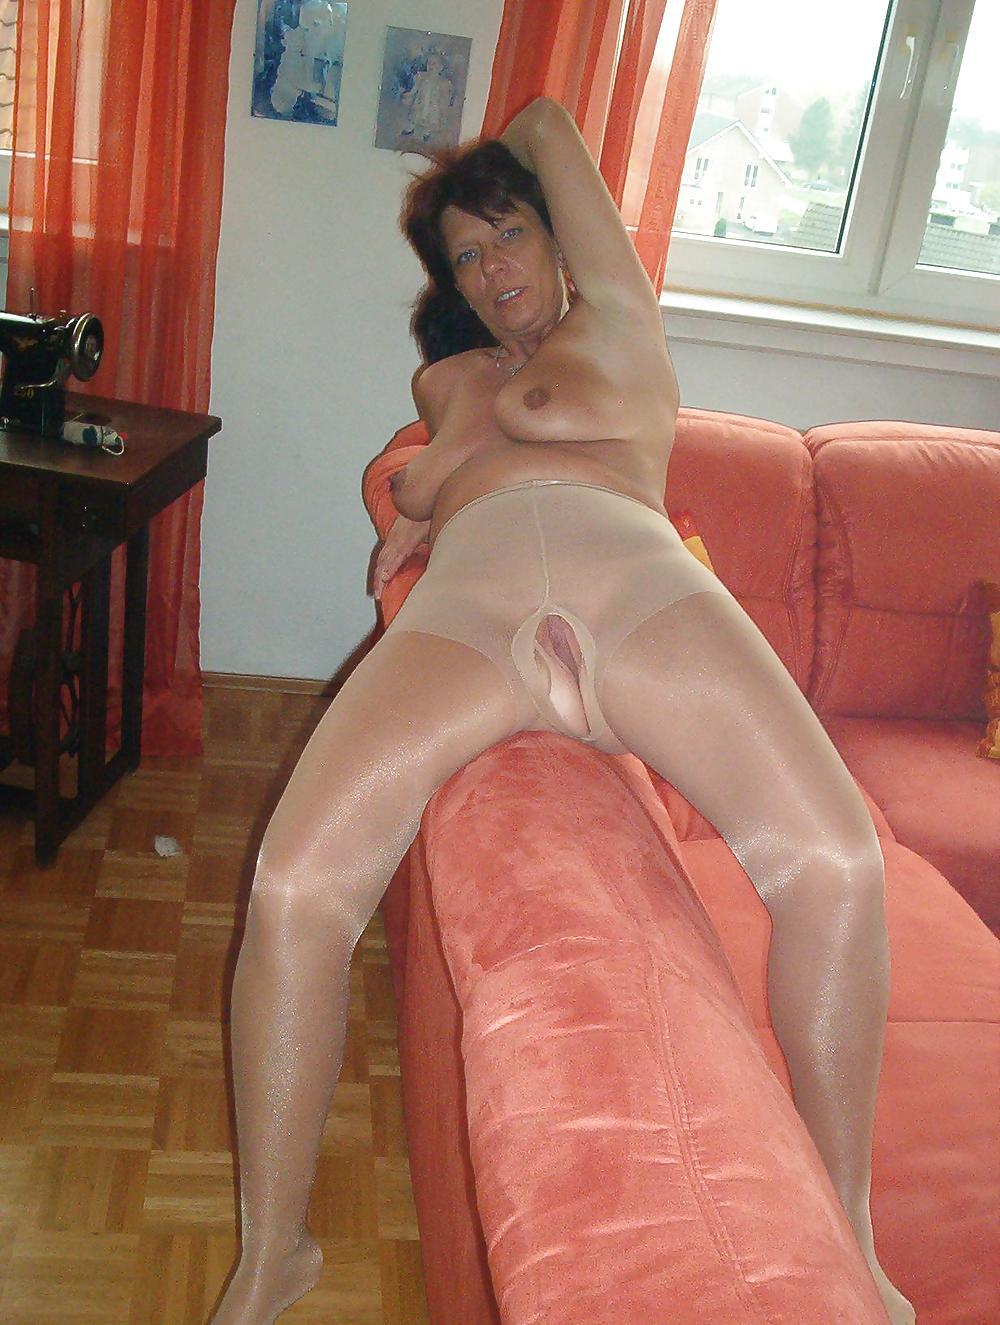 woods-free-nude-wife-pantyhose-pics-wwe-diva